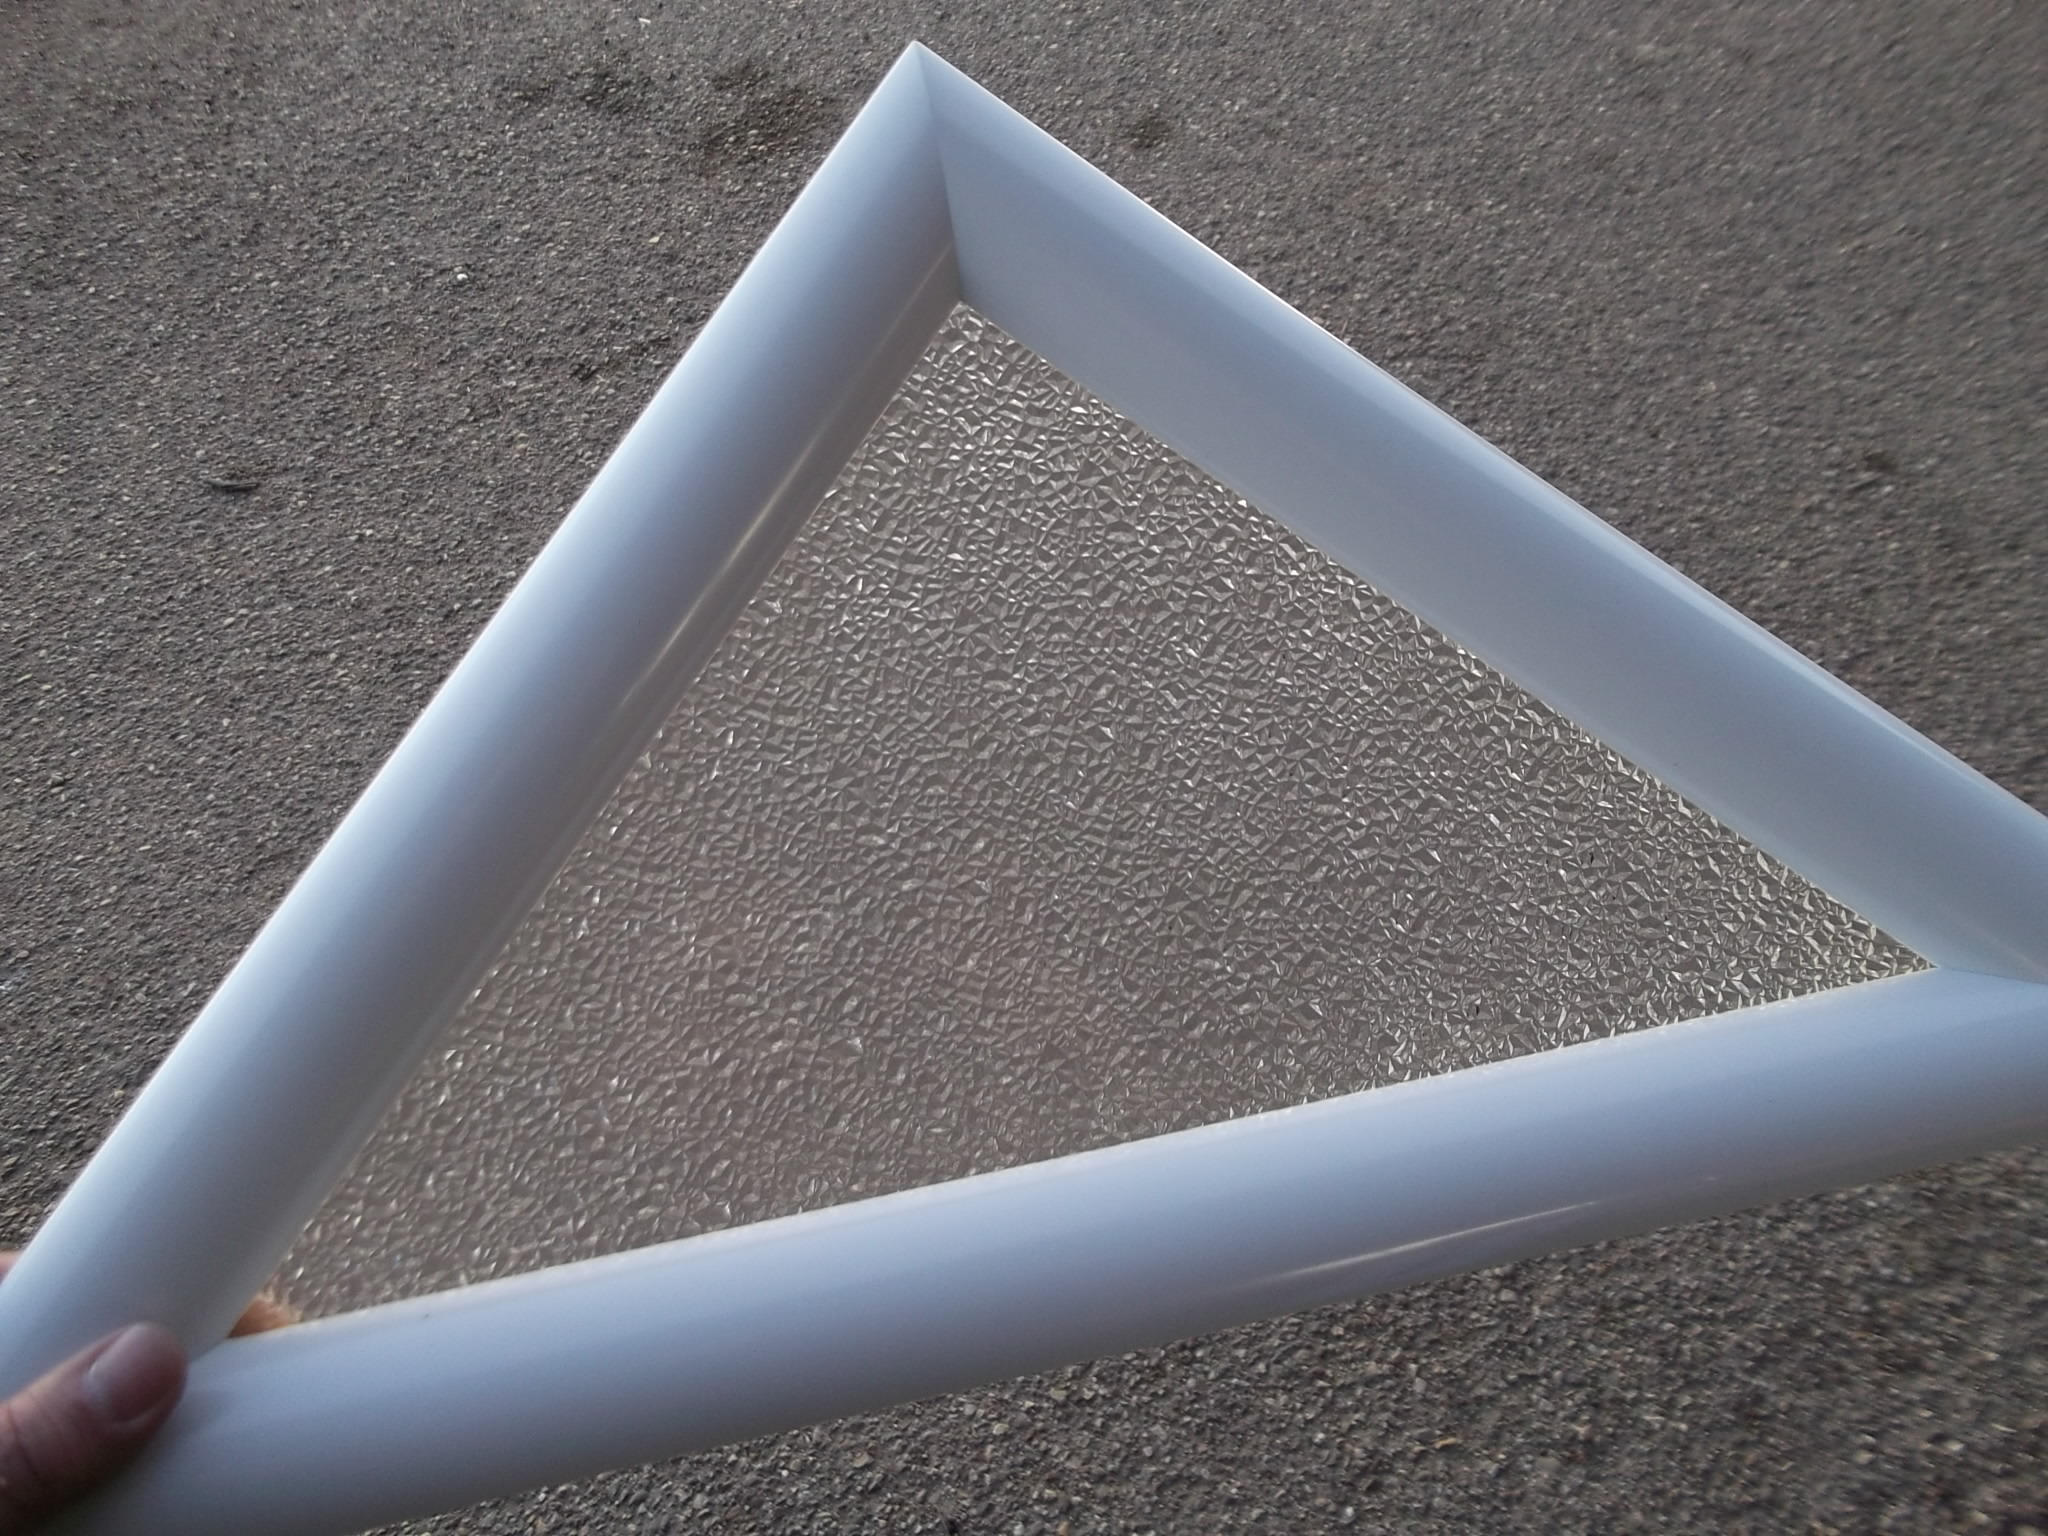 hublot triangulaire pvc blanc 1 vitre opaque al atoire. Black Bedroom Furniture Sets. Home Design Ideas